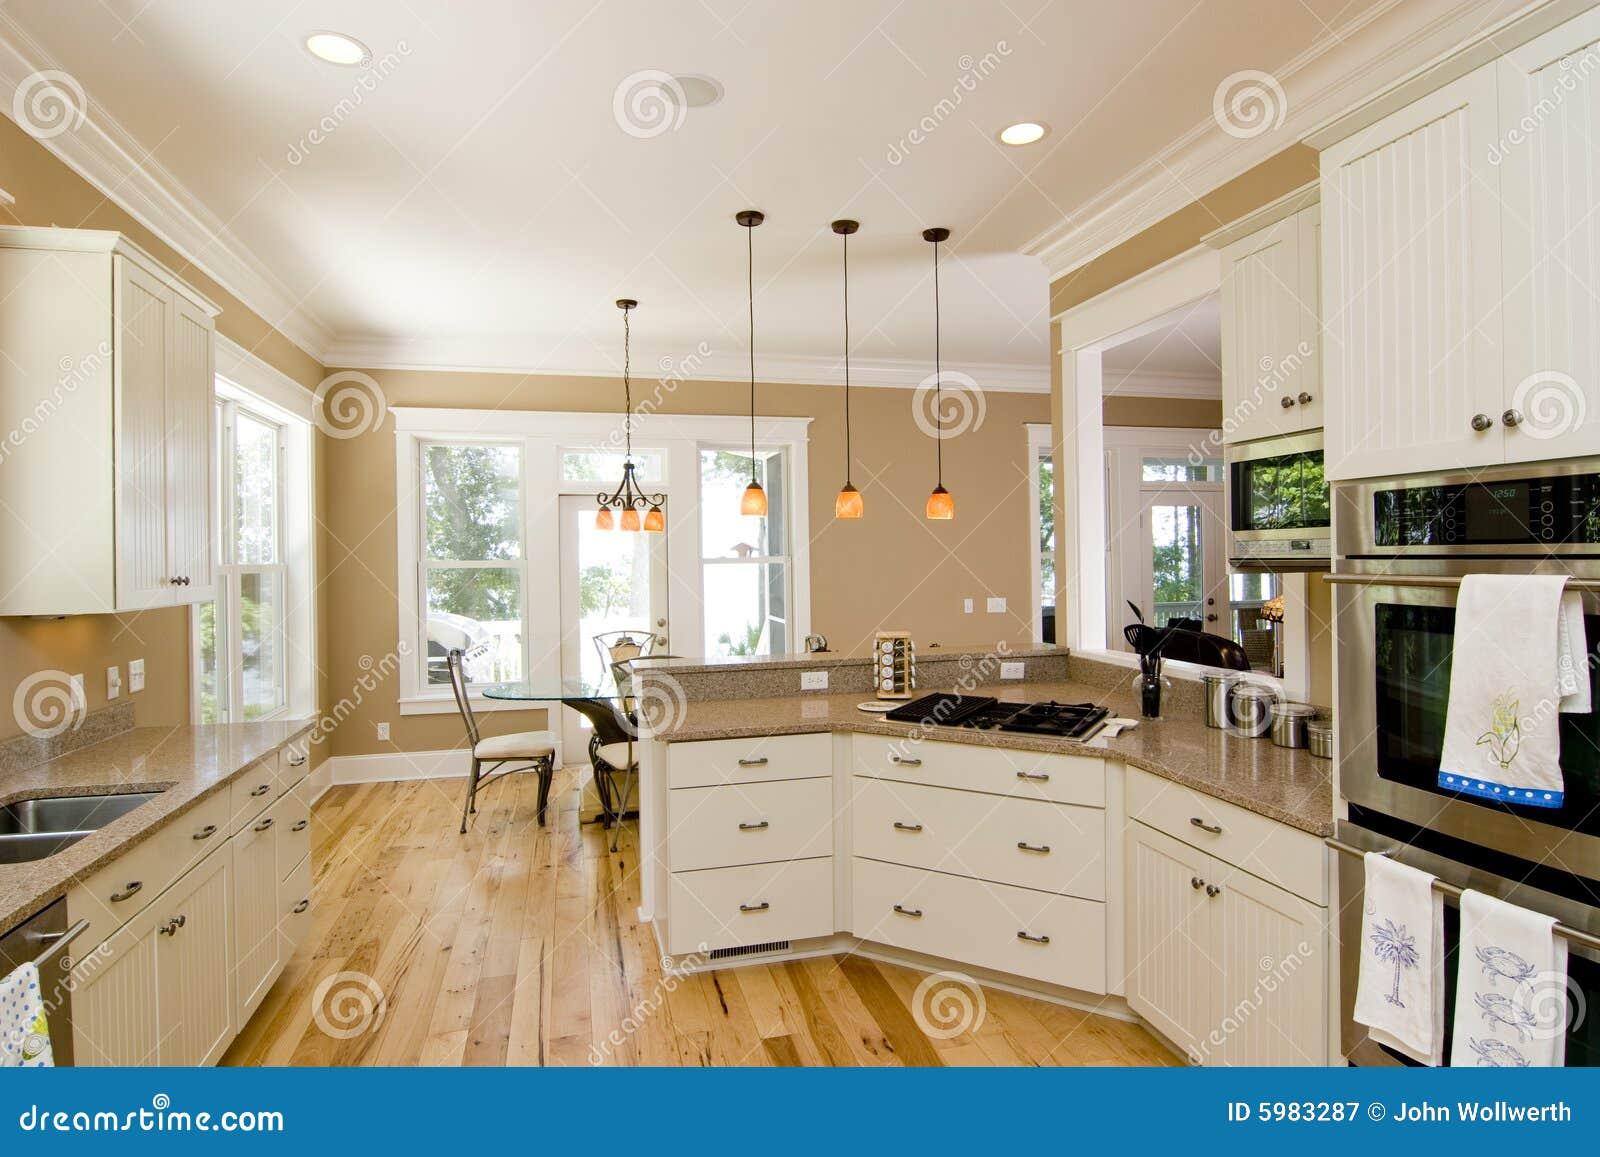 Cozinha bonita fotografia de stock royalty free imagem for Kitchen designs that stand the test of time